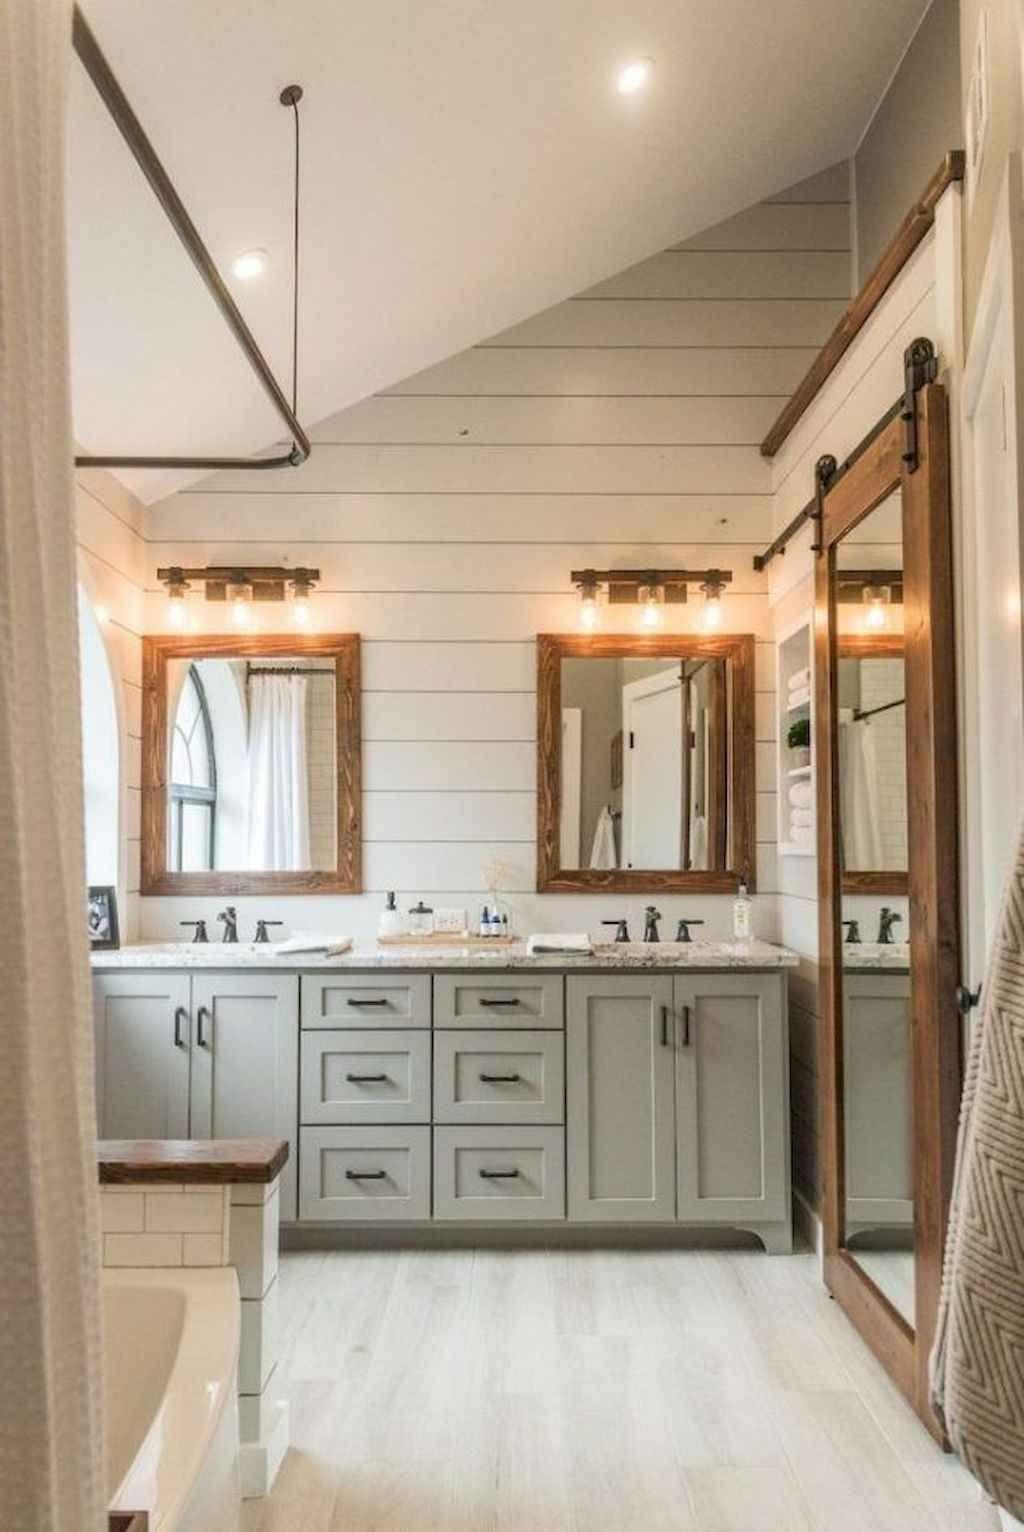 Marvelous Master Bathroom Ideas For Home25